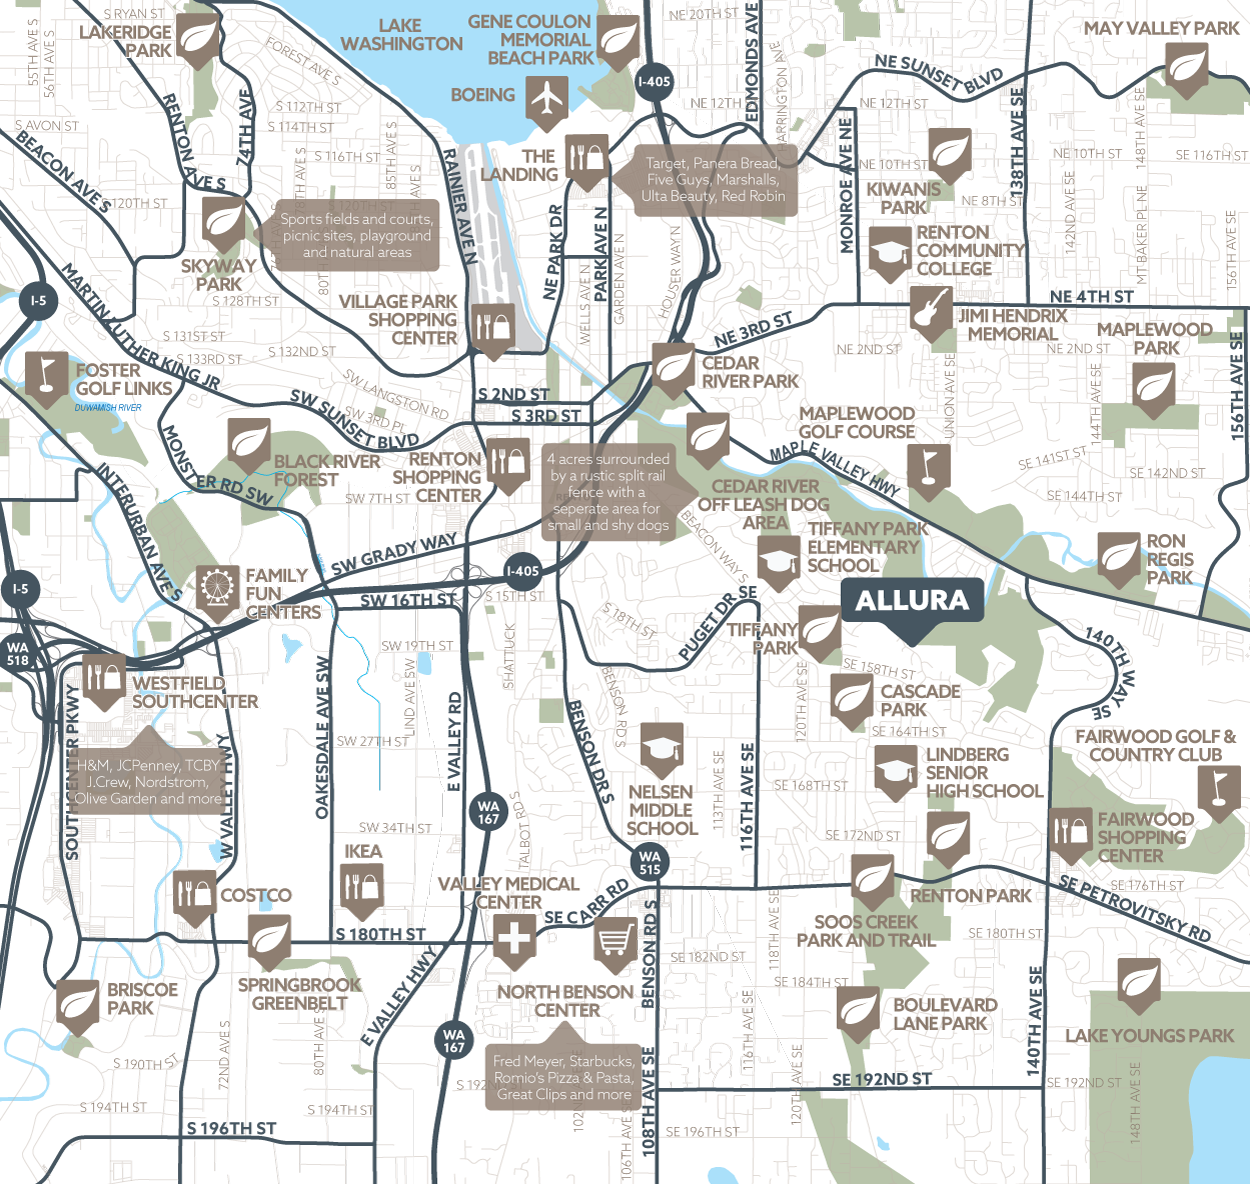 Allura amenity map